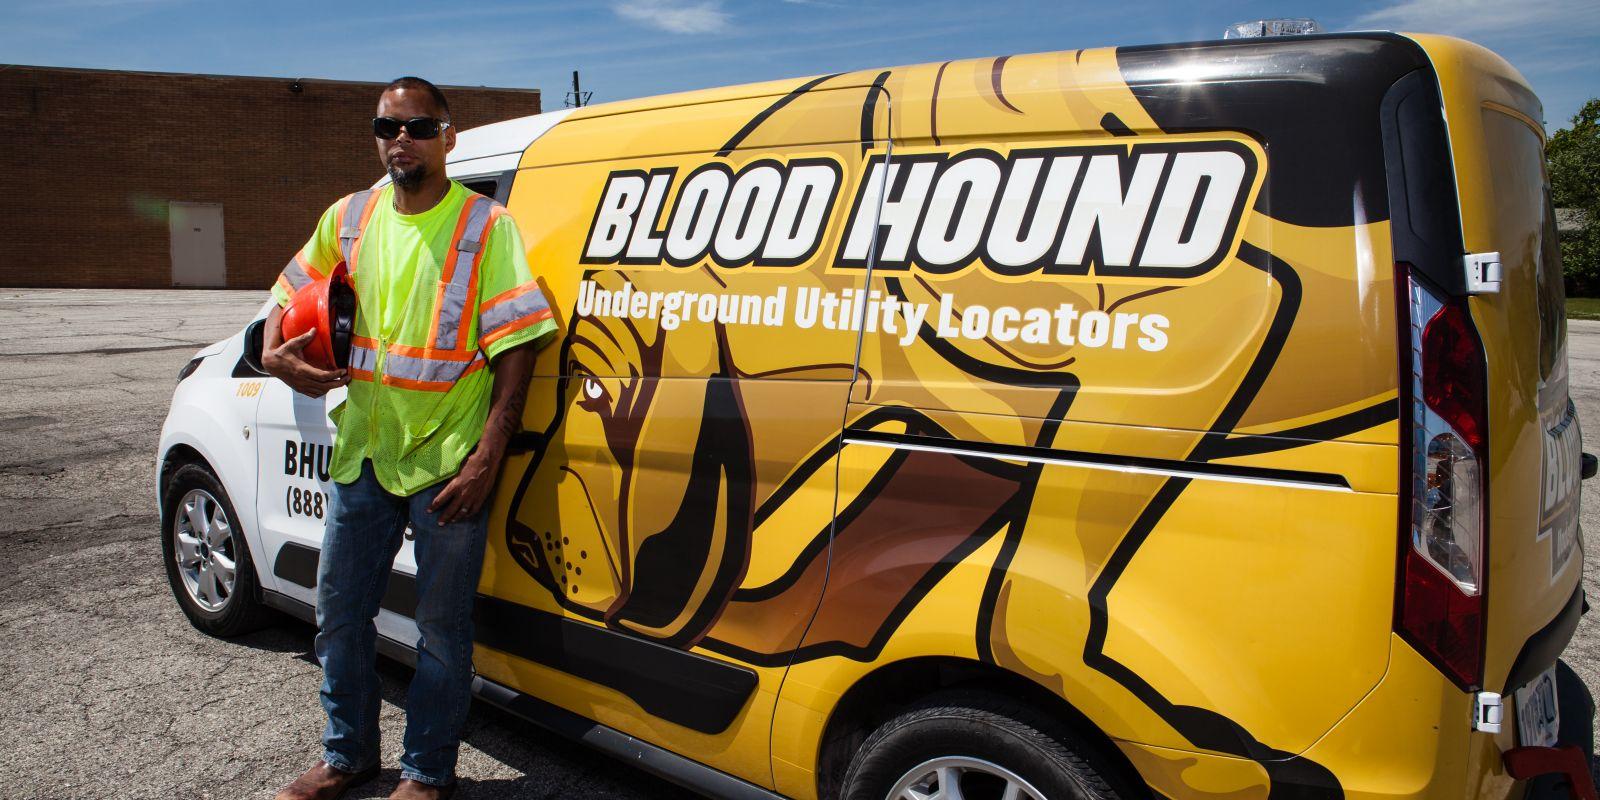 Funny Utlity Locator : Utility locating in chicago blood hound llc